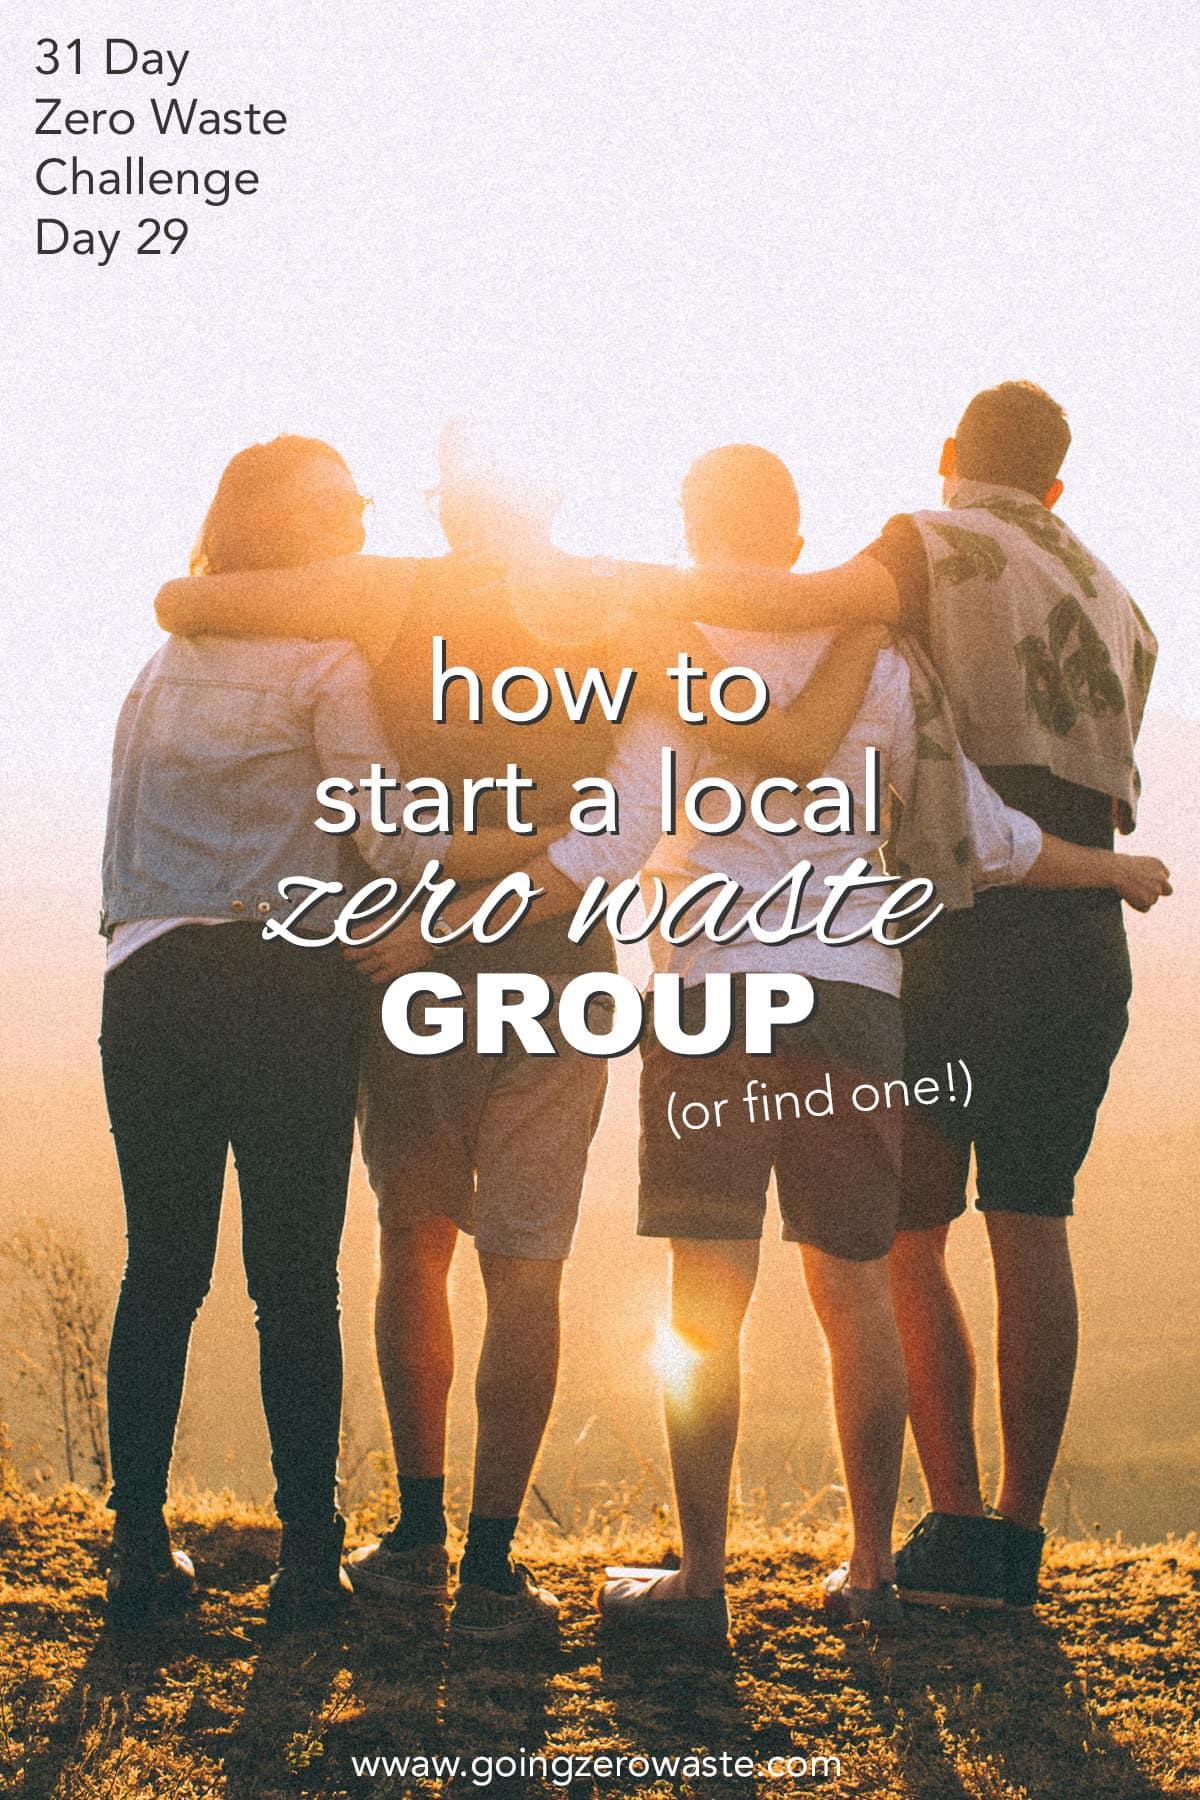 Start a Local Zero Waste Group - Day 29 of the Zero Waste Challenge from www.goingzerowaste.com #zerowaste #ecofriendly #gogreen #sustainable #zerowastechallenge #challenge #sustainablelivingchallenge #startalocalgroup #zerowastegroup